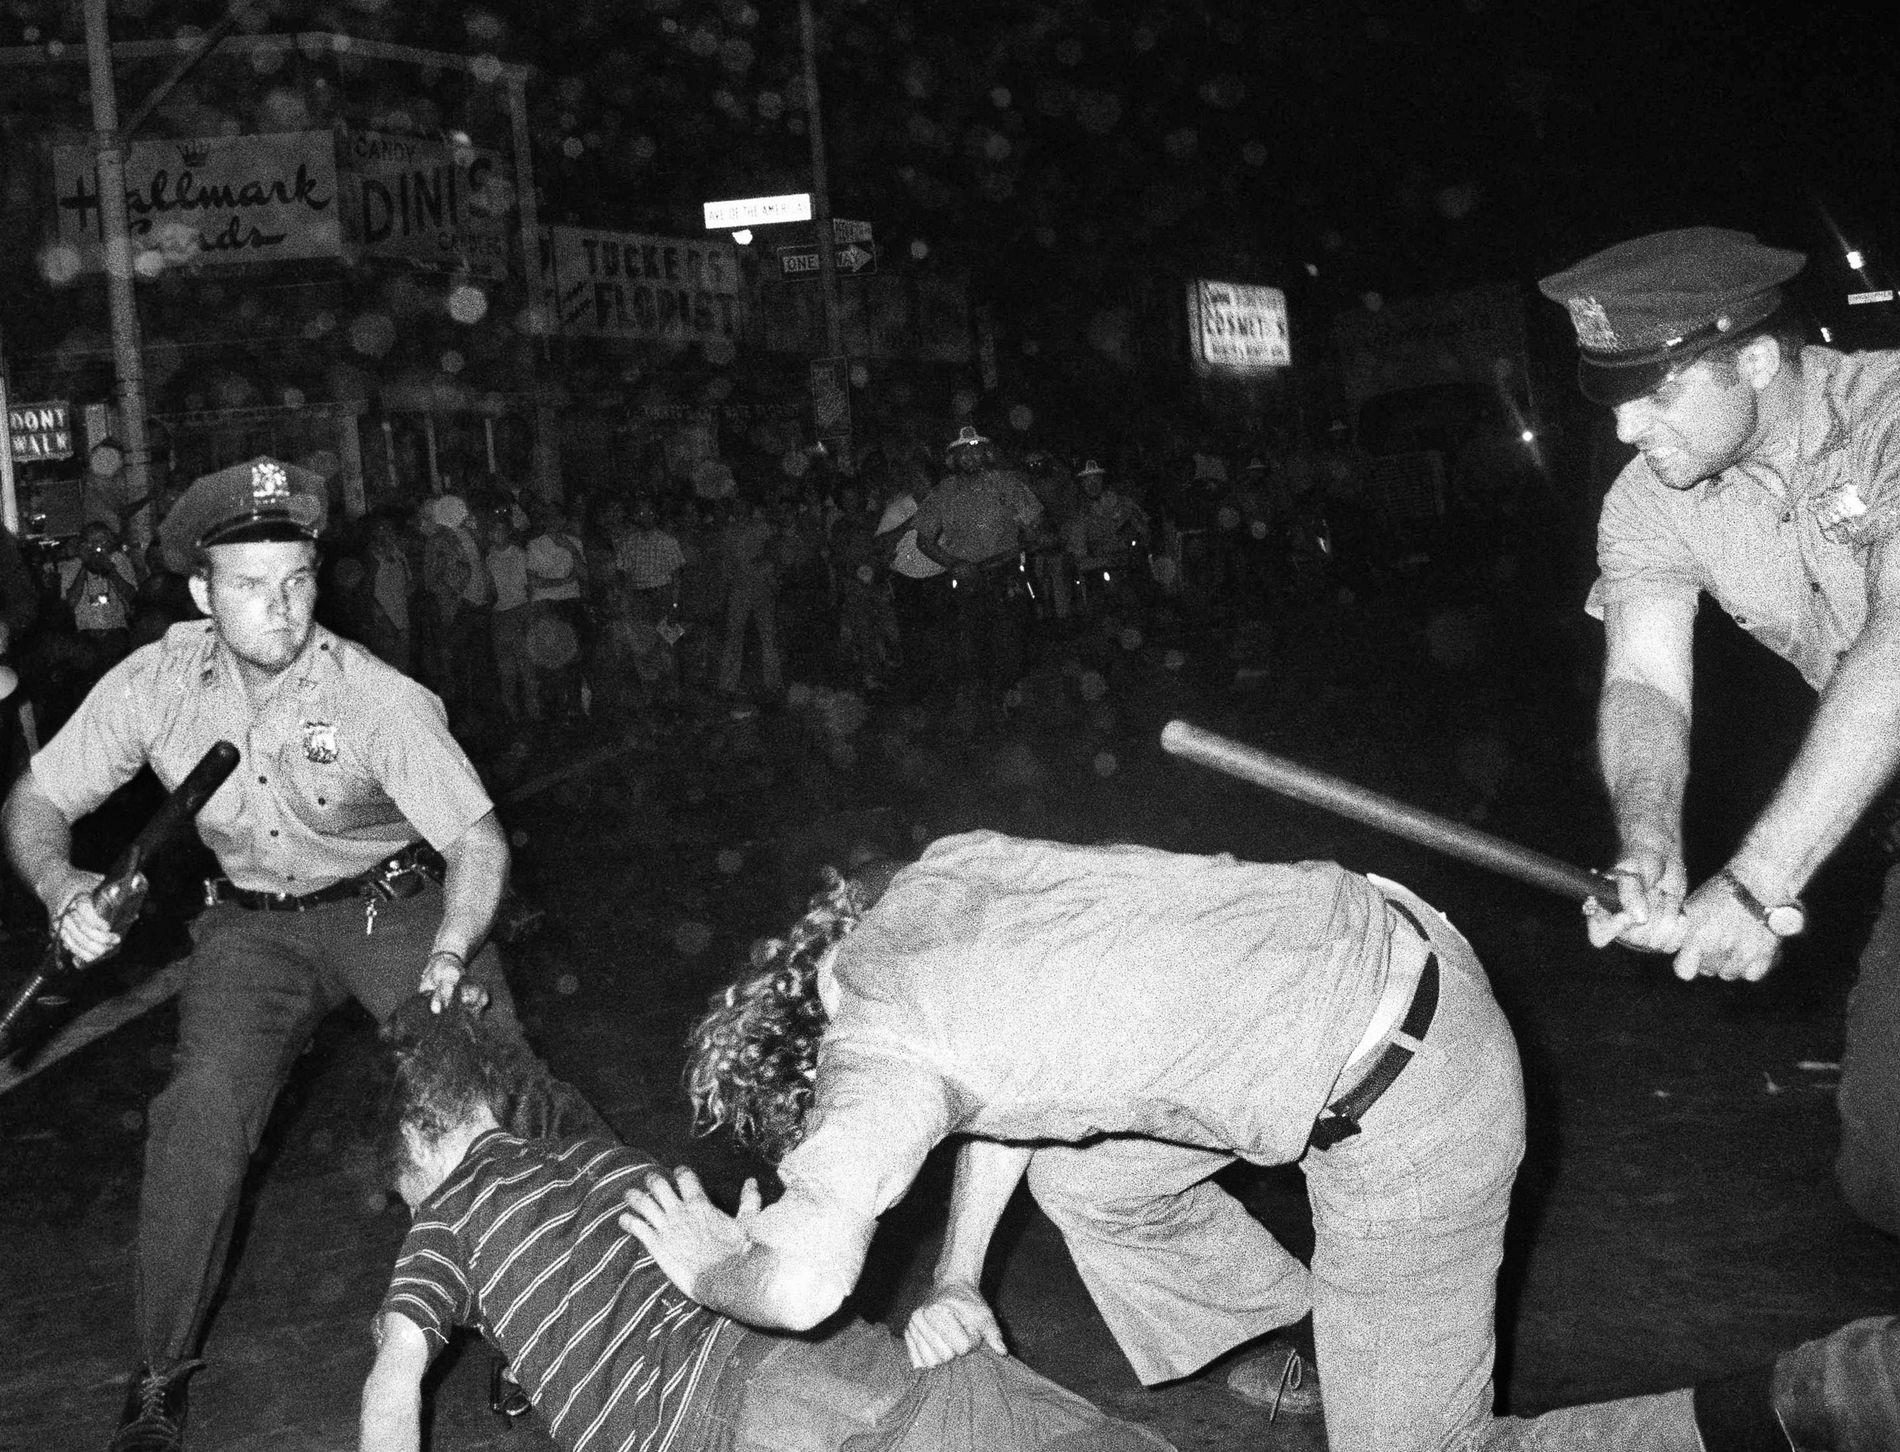 VOLD: For 50 år siden, i 1969, begynte de homofile i New York en kamp mot politiets undertrykking, en kamp som endret historien, skriver gjesteskribent Petter Snare.